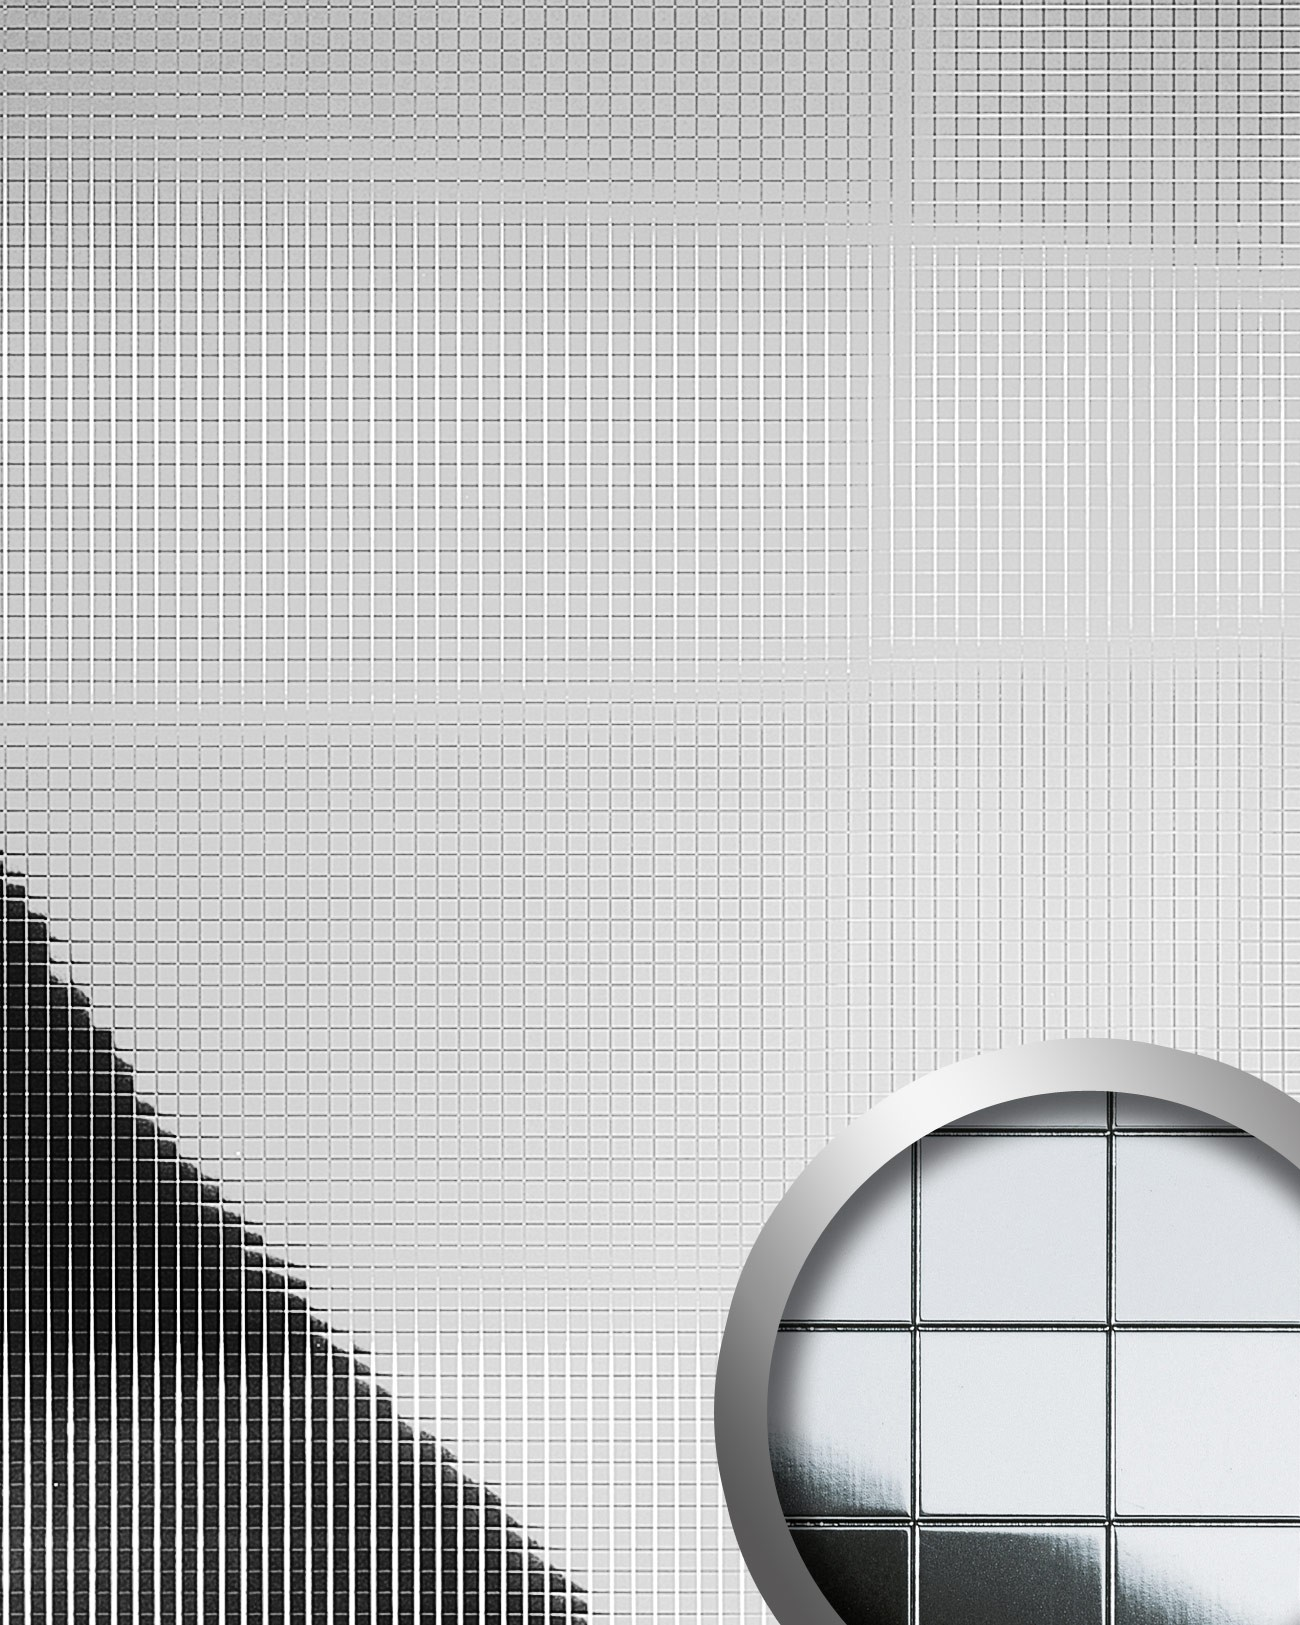 wandverkleidung wandpaneel wallface 10639 m style design paneel metall mosaik fliesen. Black Bedroom Furniture Sets. Home Design Ideas